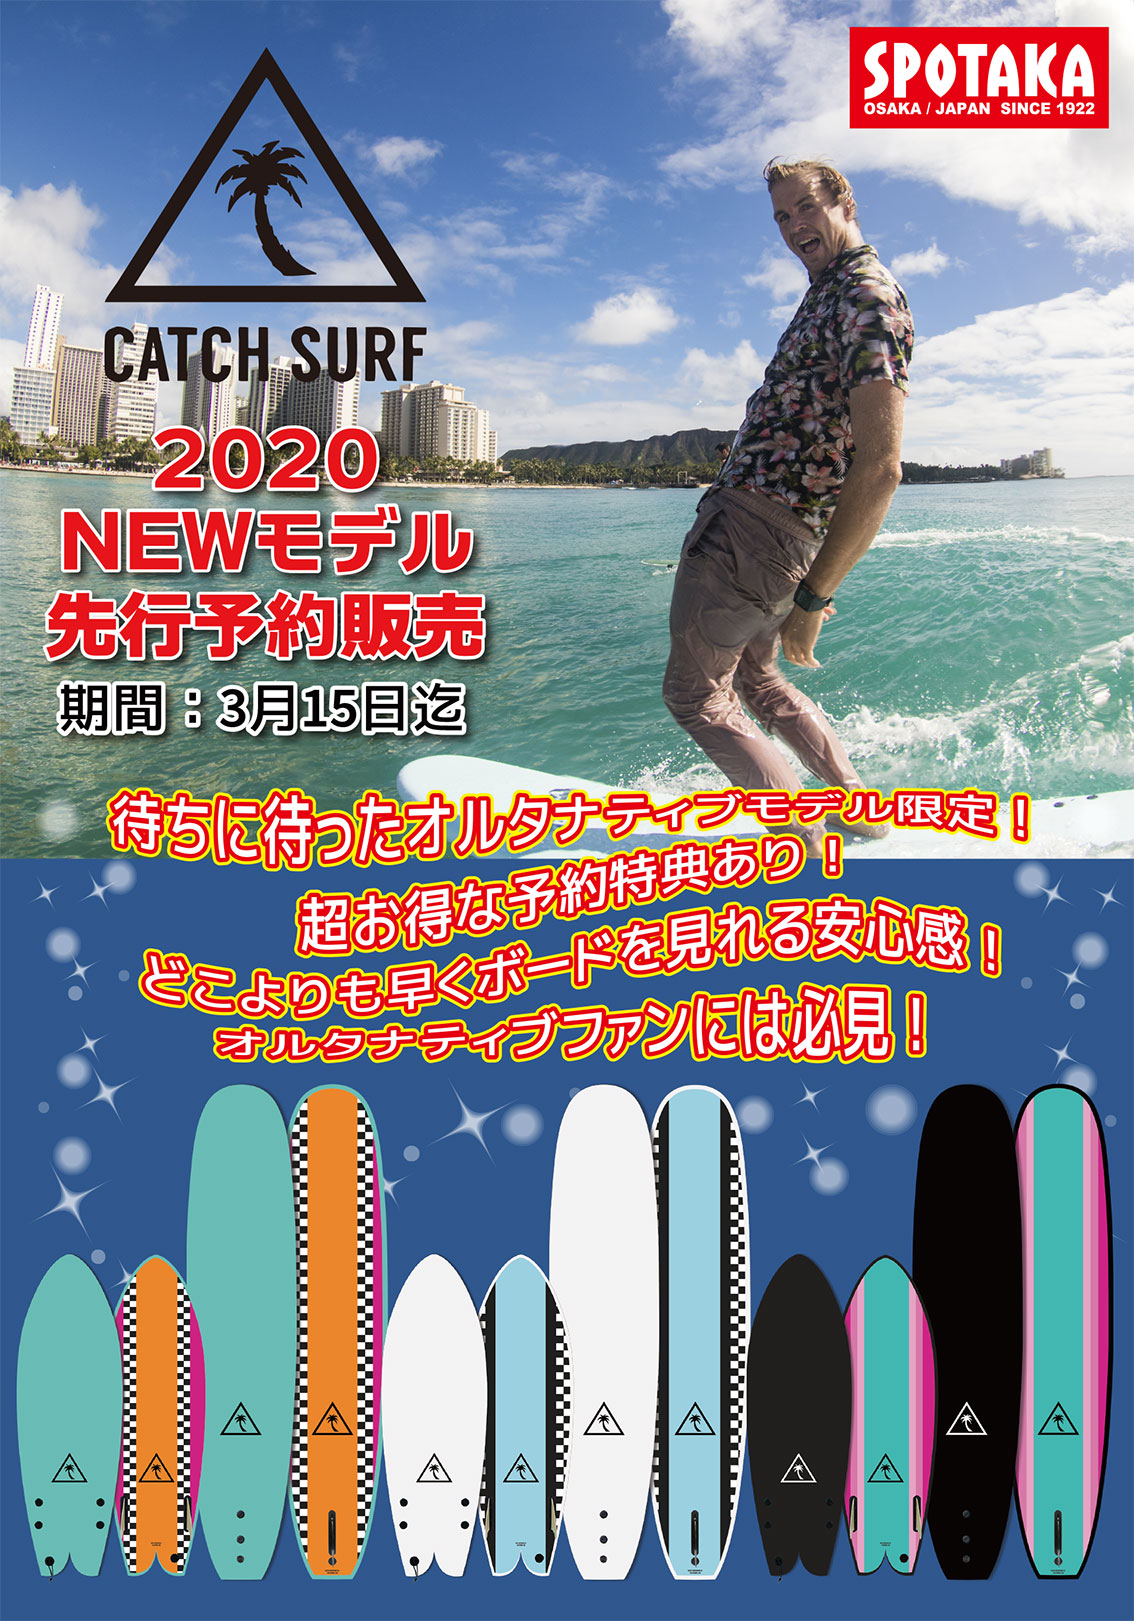 CATCH SURF x SPOTAKA NEWモデル先行予約販売 実施中です!